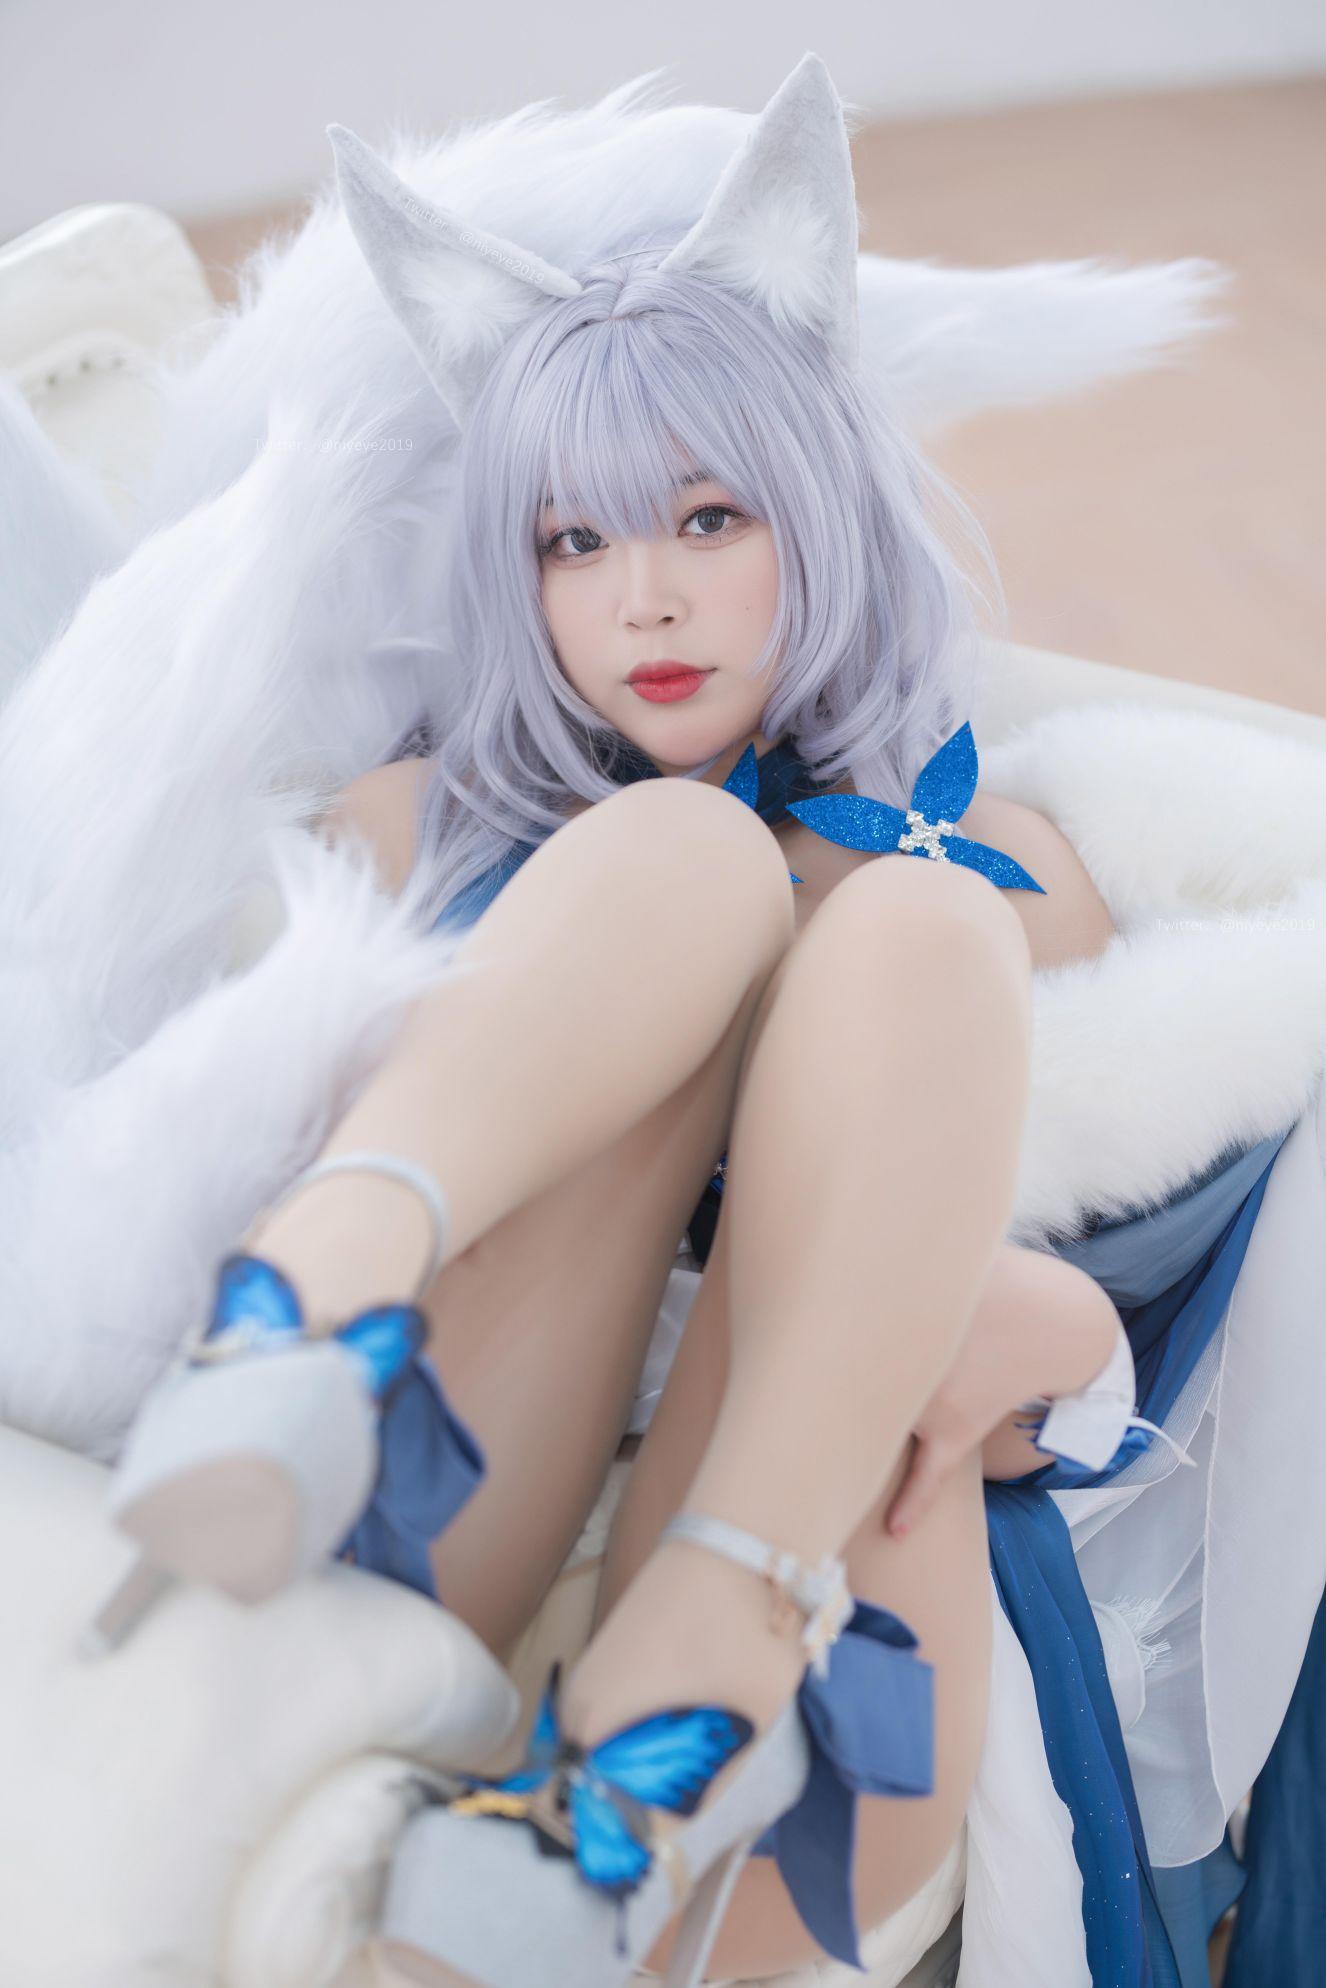 Azur Lane Shinano Cosplay by Bai Ye Extra Enticing Inviting 51